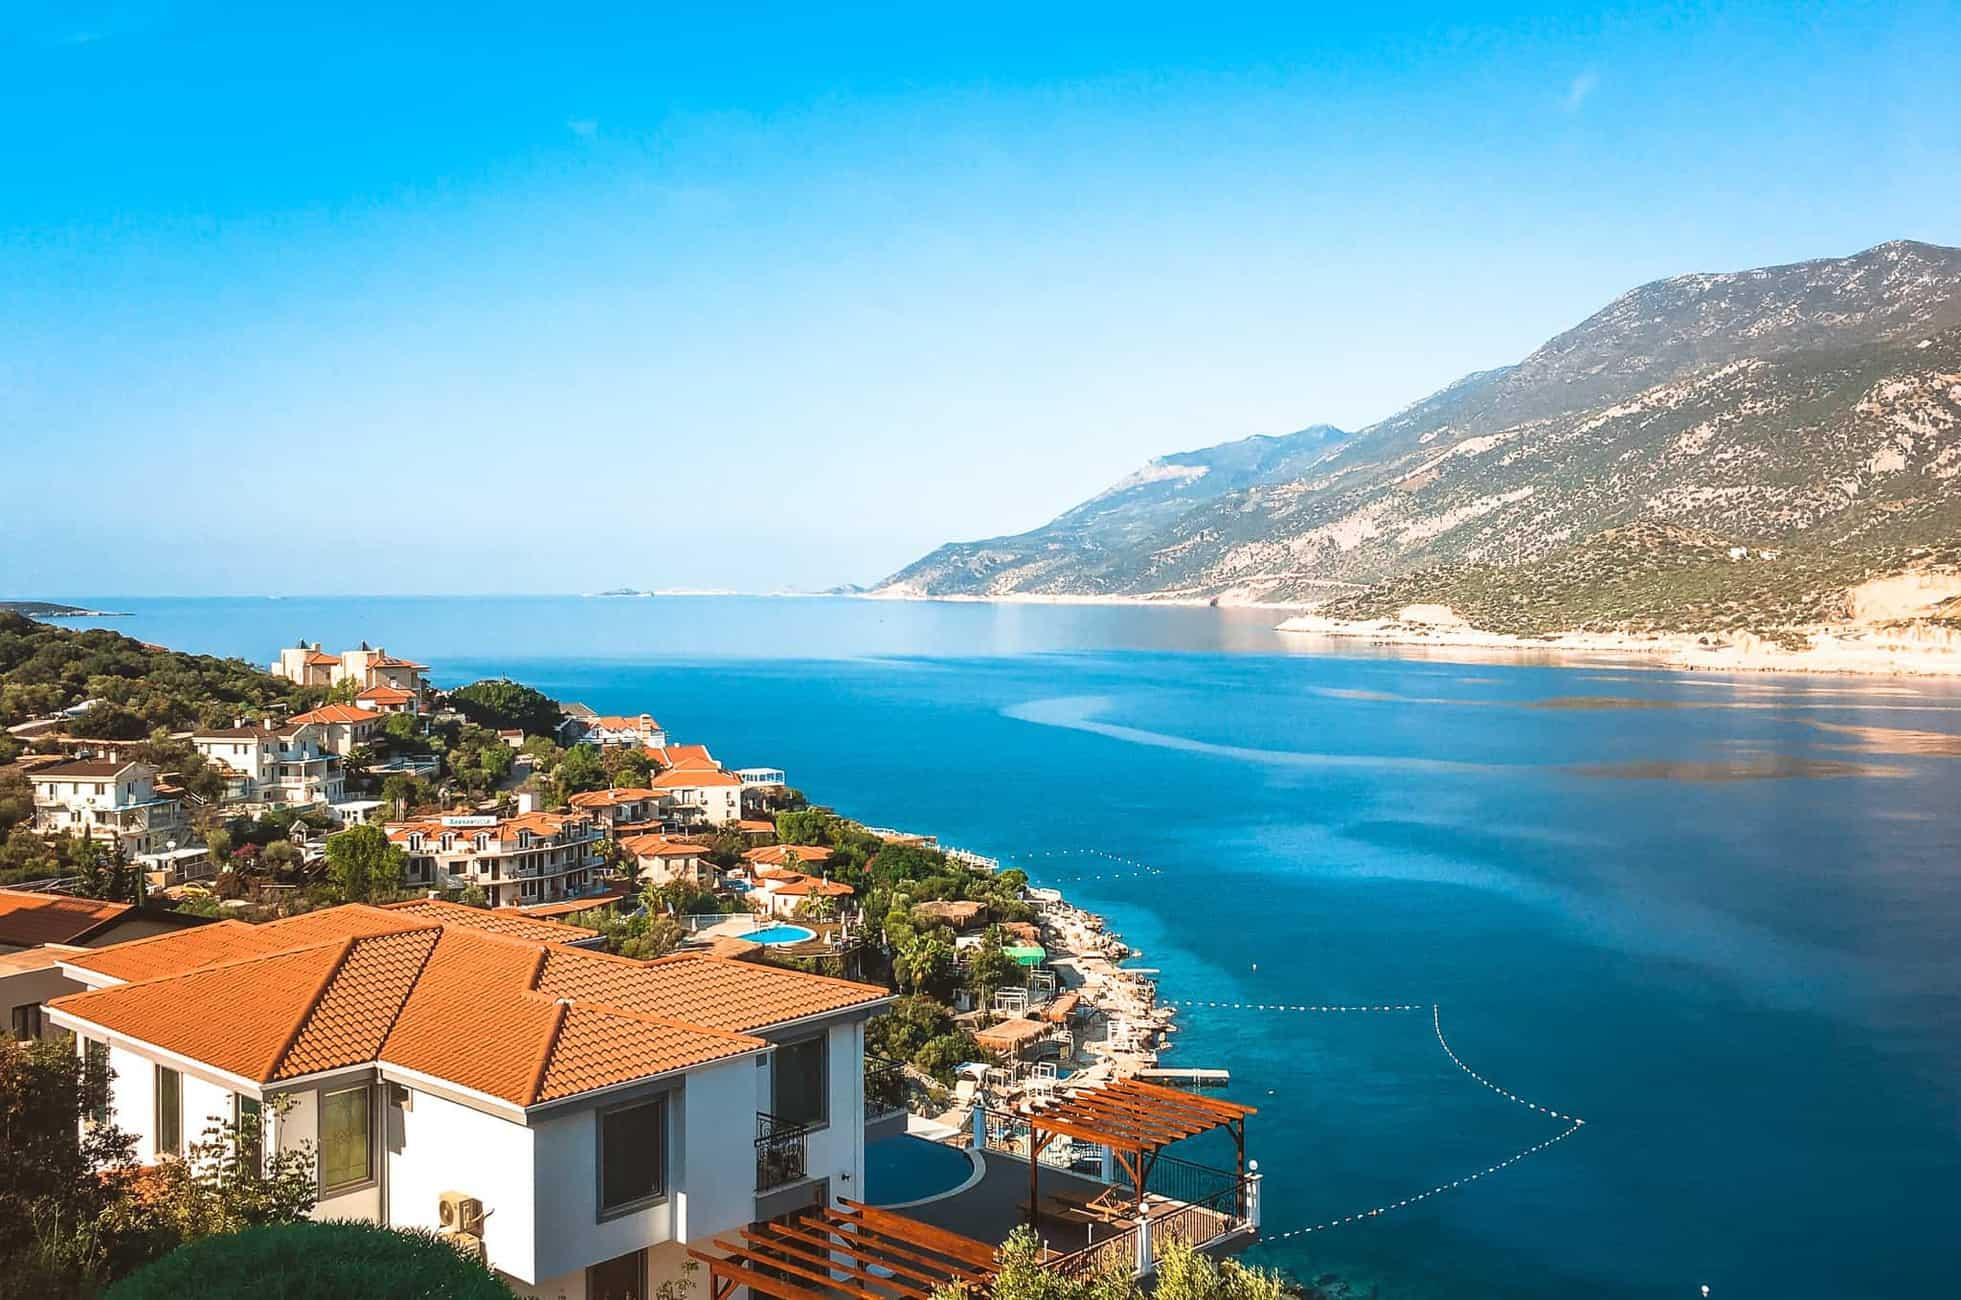 Waterfront views in Kaş